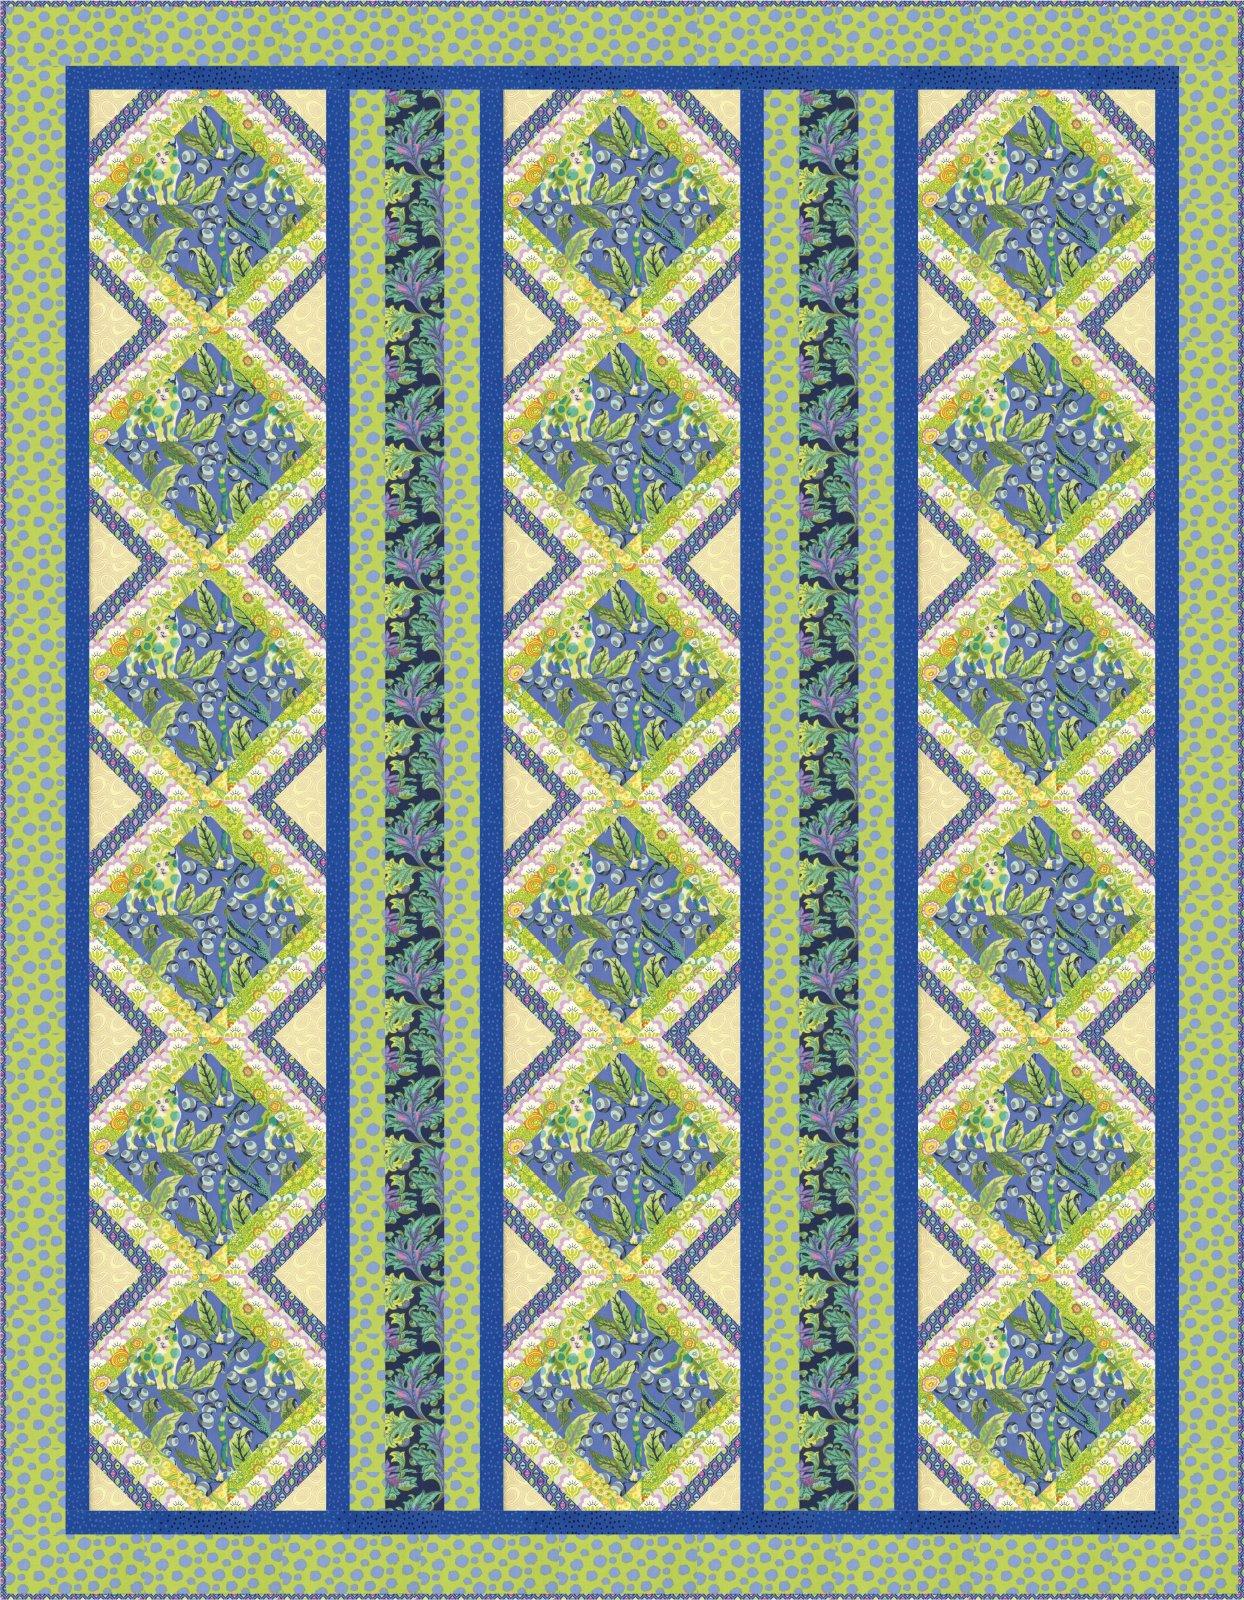 Zazzy Quilt Kit - Tula Tabby Road and Kaffe Fassett Fabrics